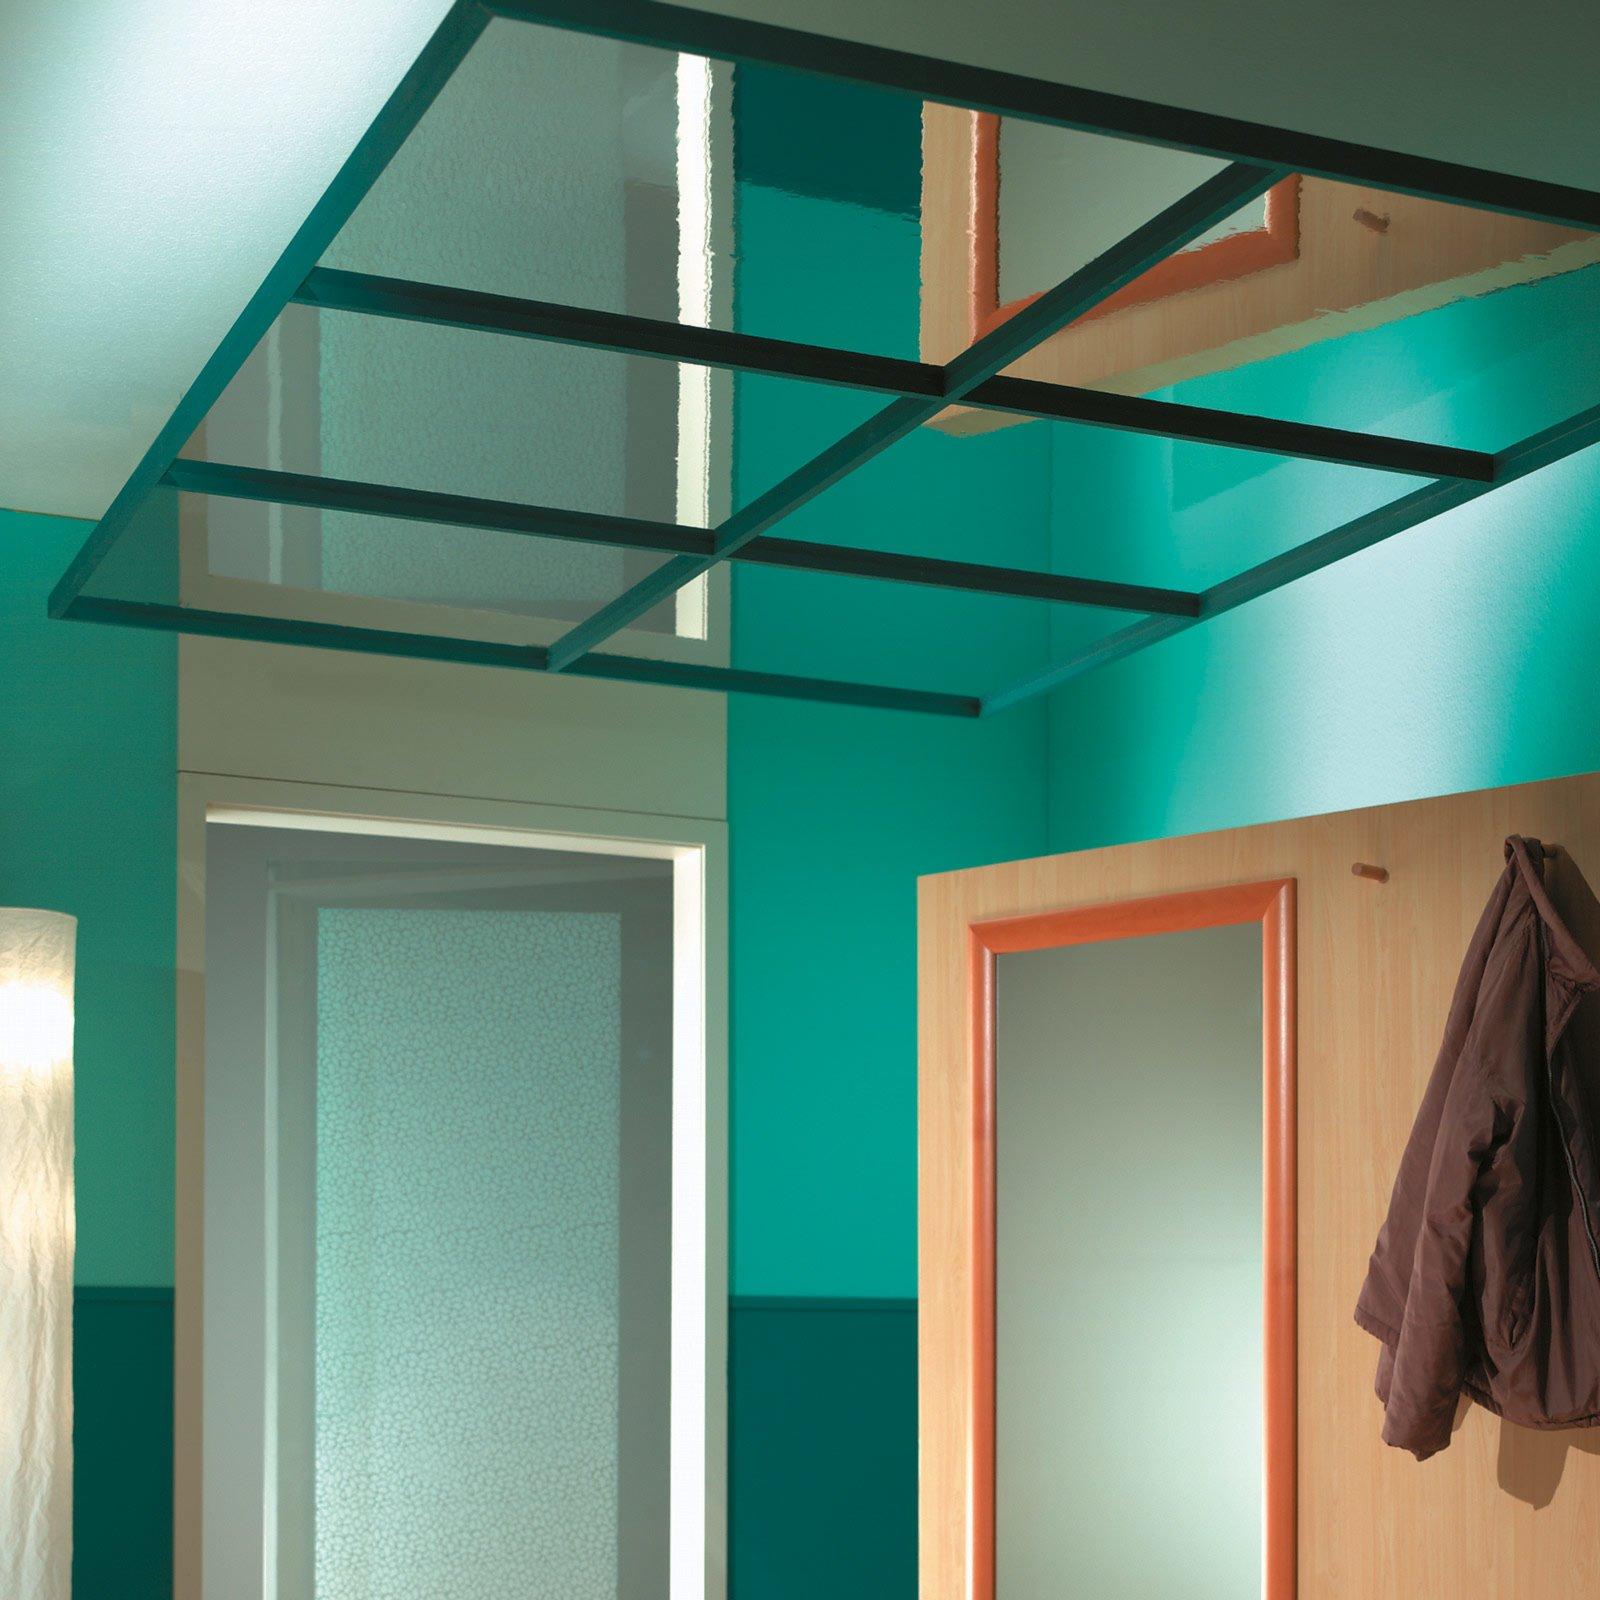 d c fix klebefolie spiegelfolie 45x150 cm dekor m belfolie klebefolie renovieren. Black Bedroom Furniture Sets. Home Design Ideas